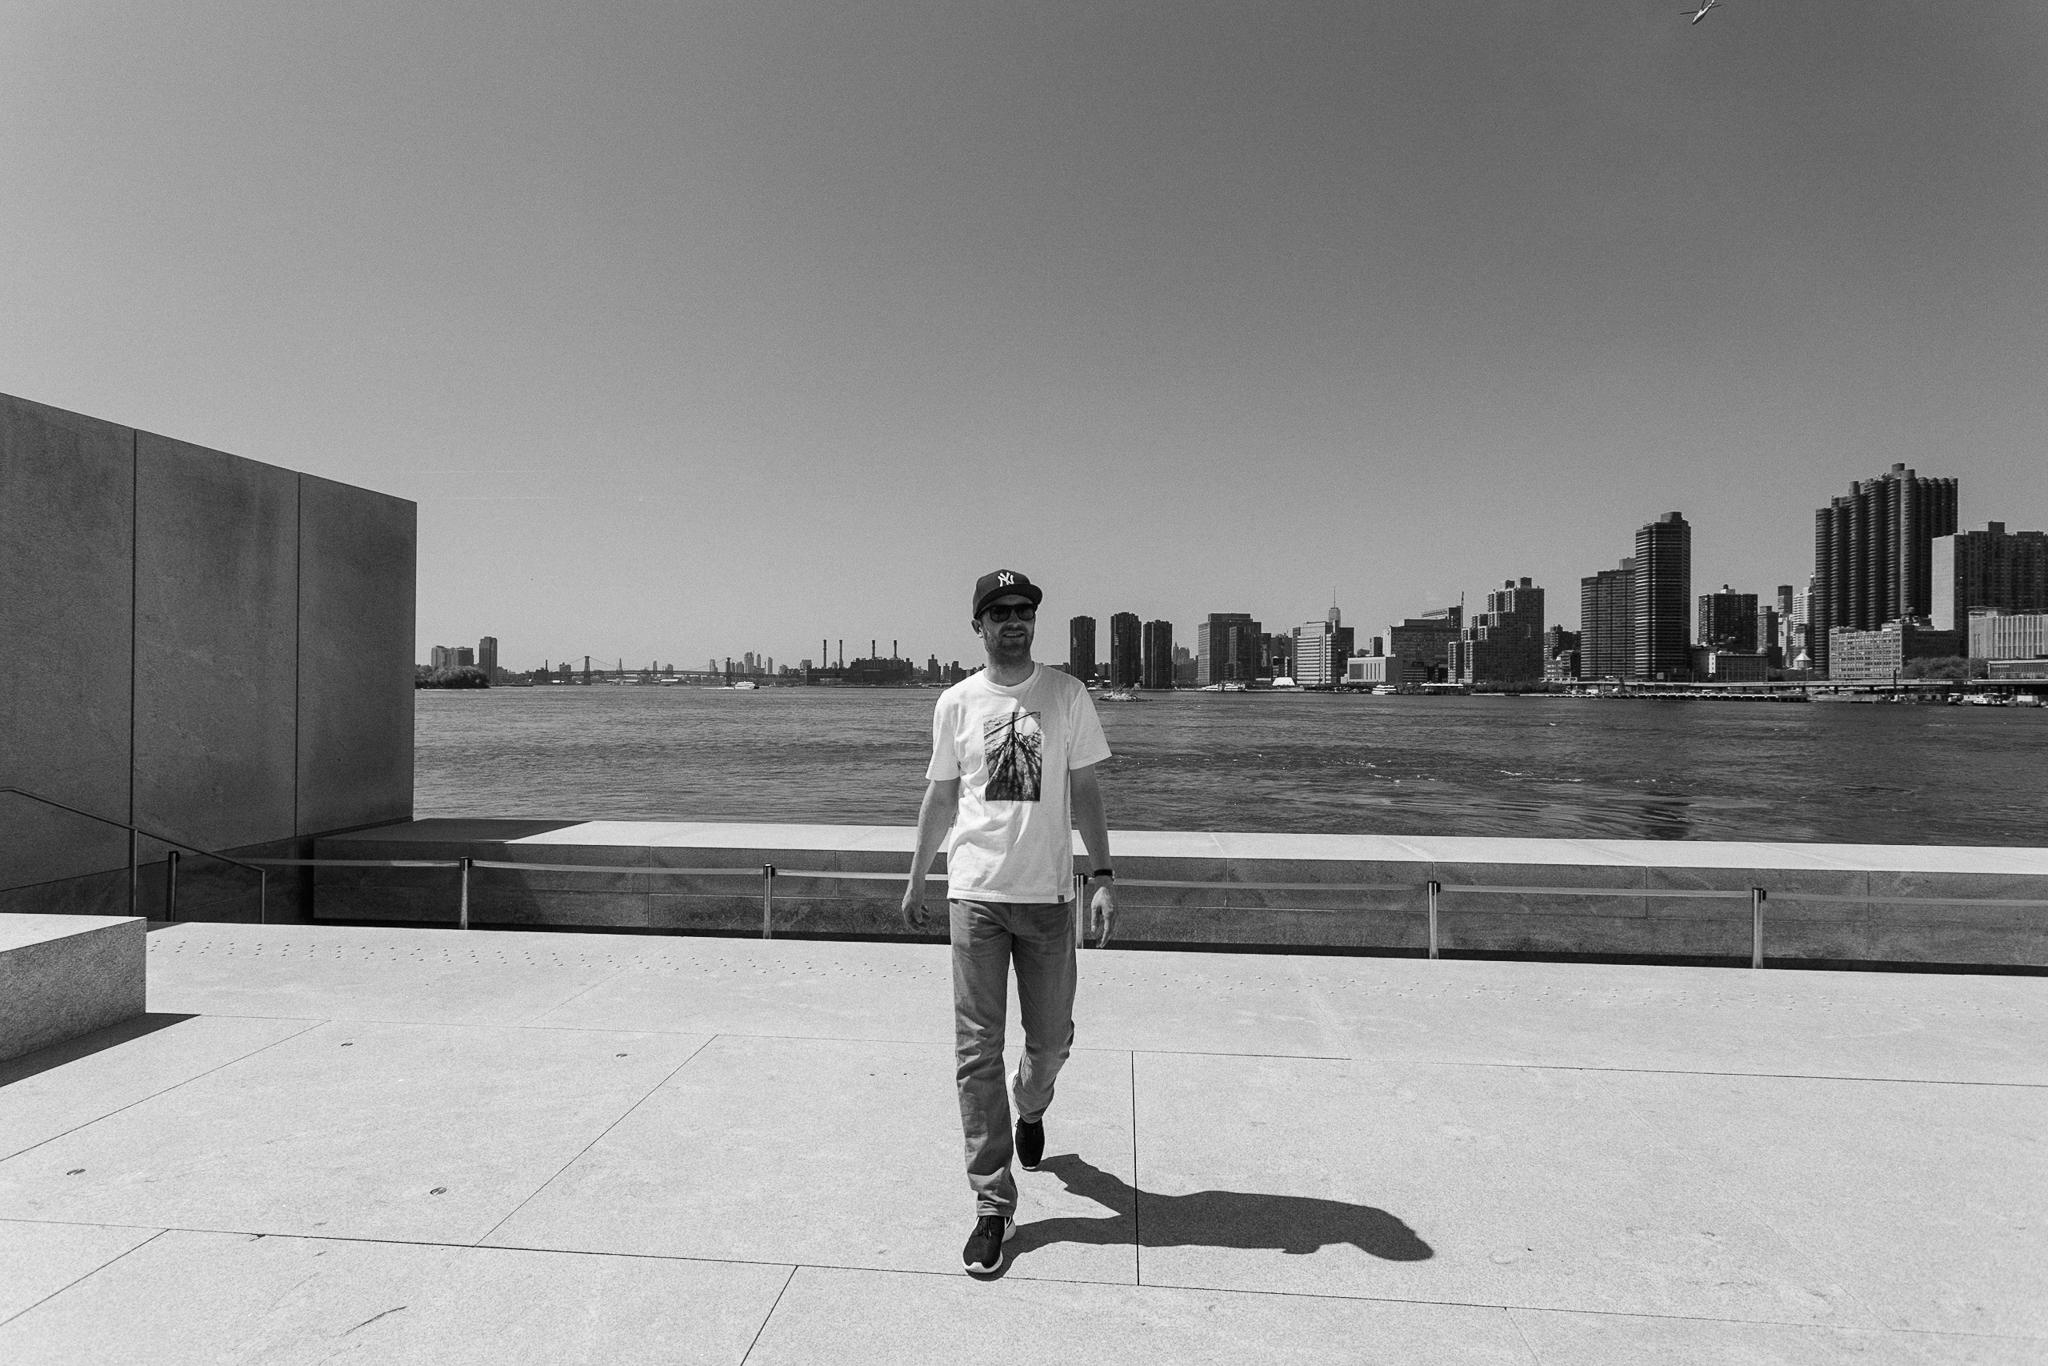 2015-05-14-NYC-3127.jpg